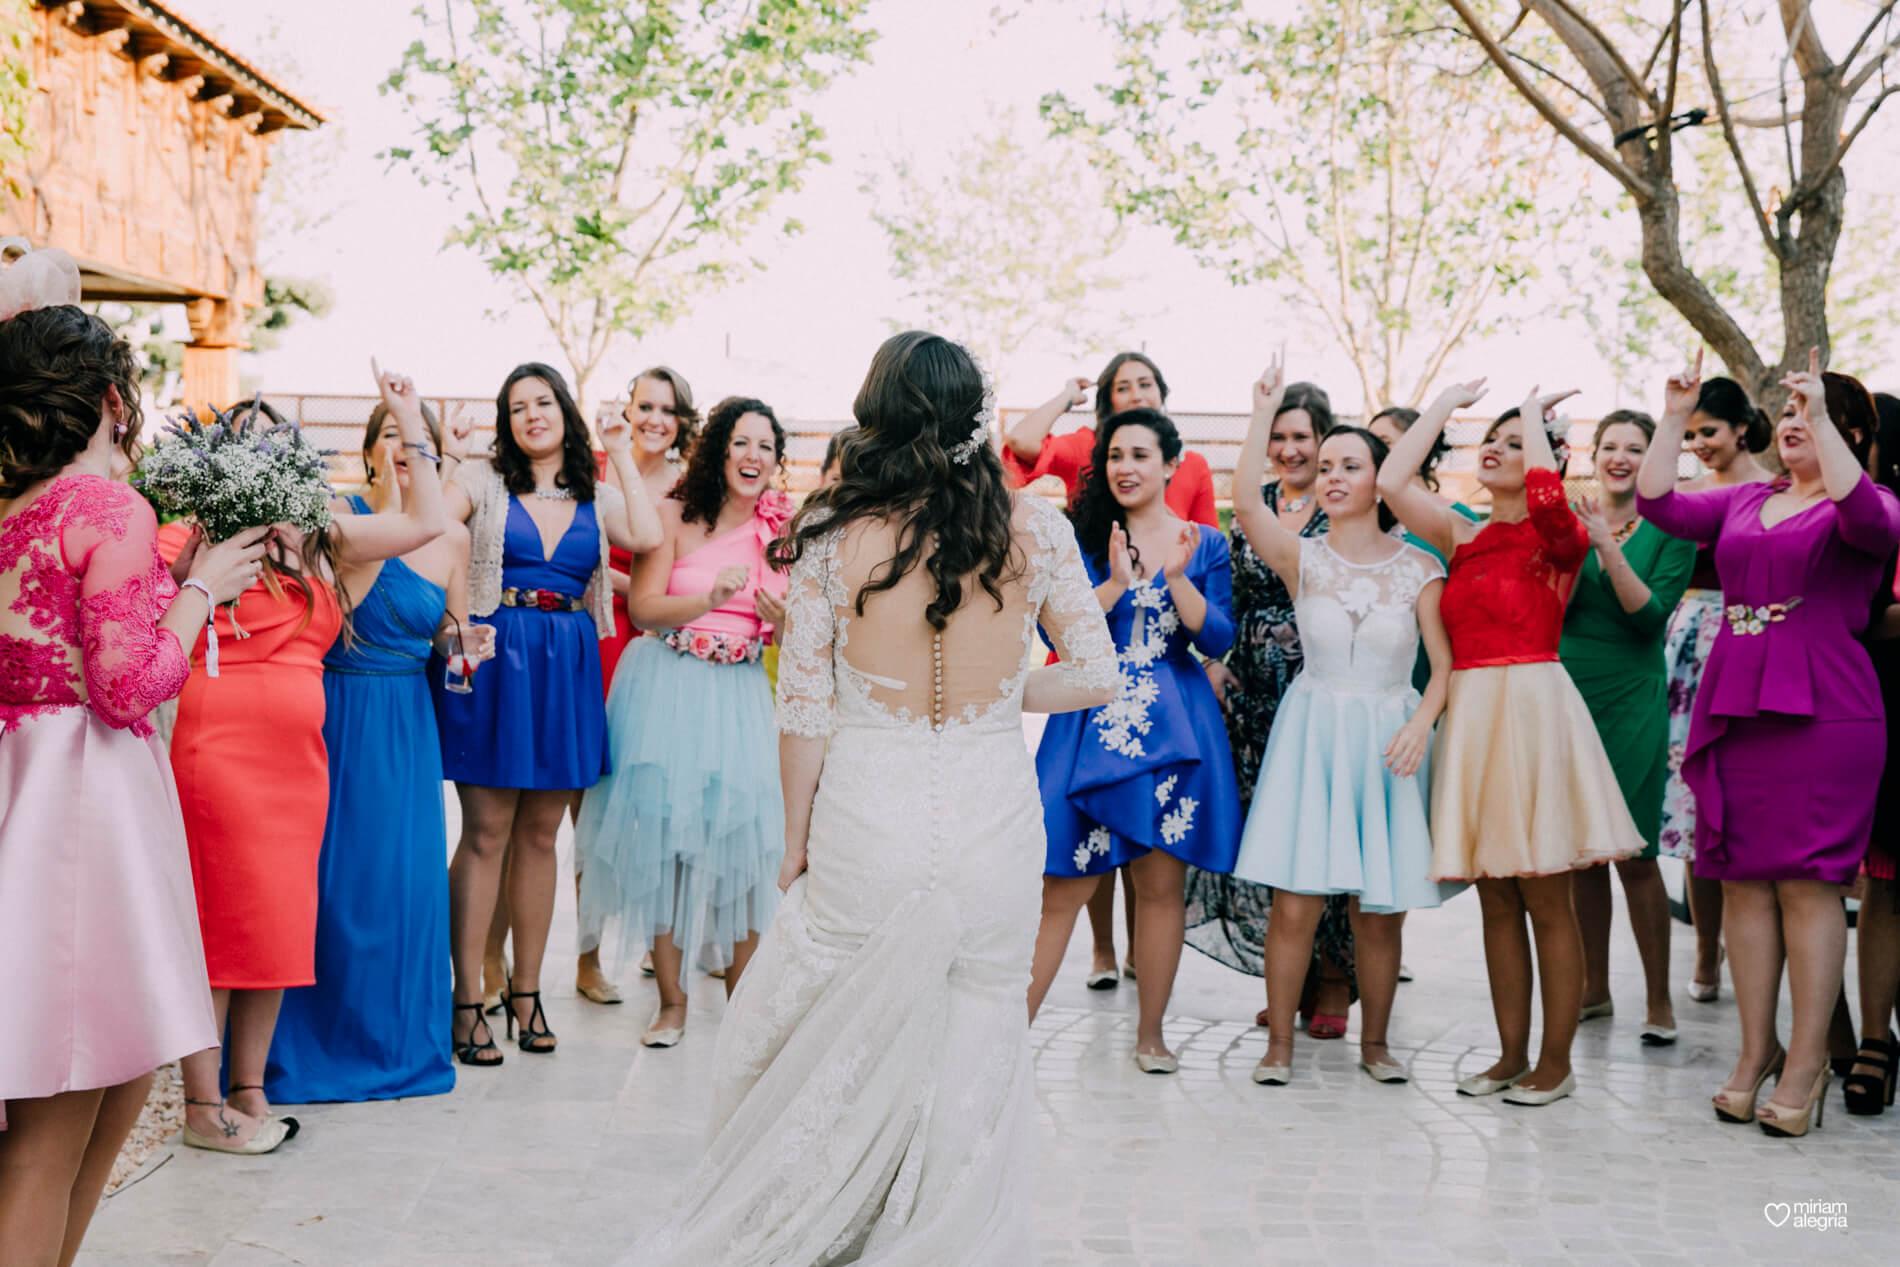 boda-en-finca-jurosa-miriam-alegria-139